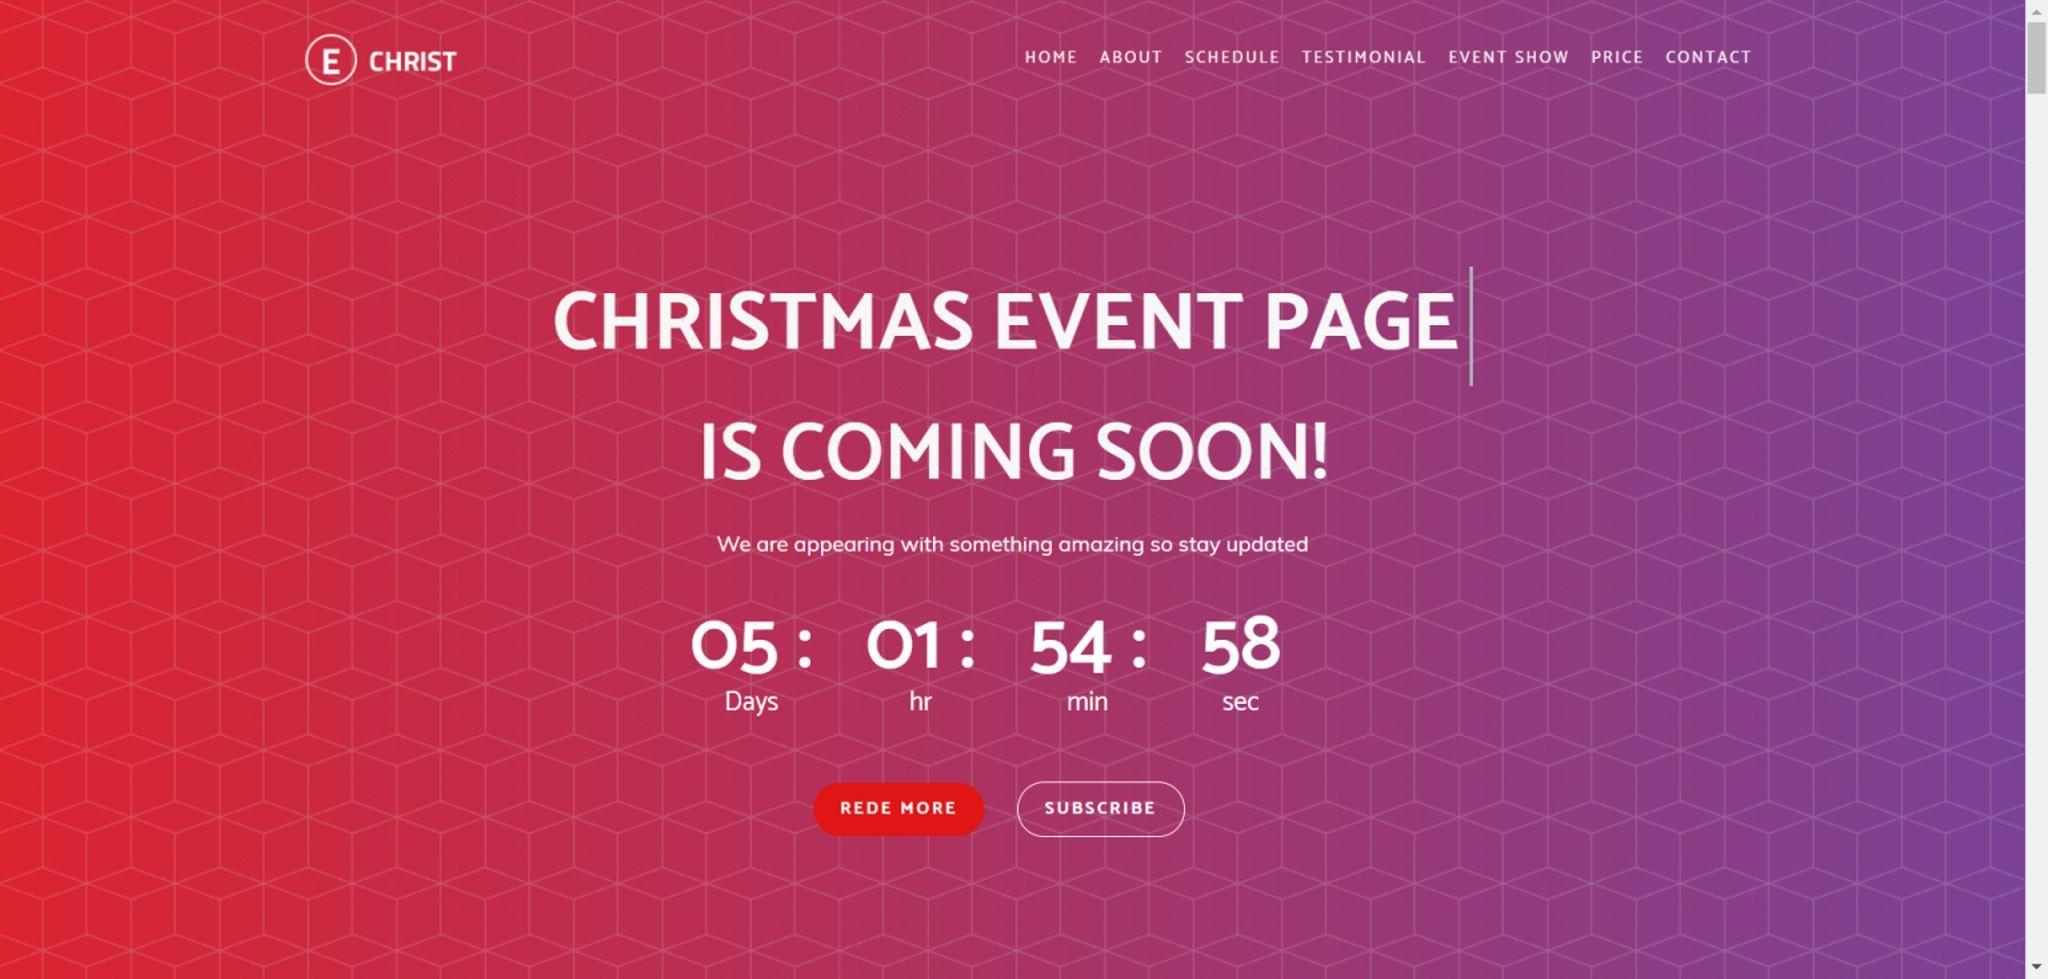 echrist responsive event landing page template design studio